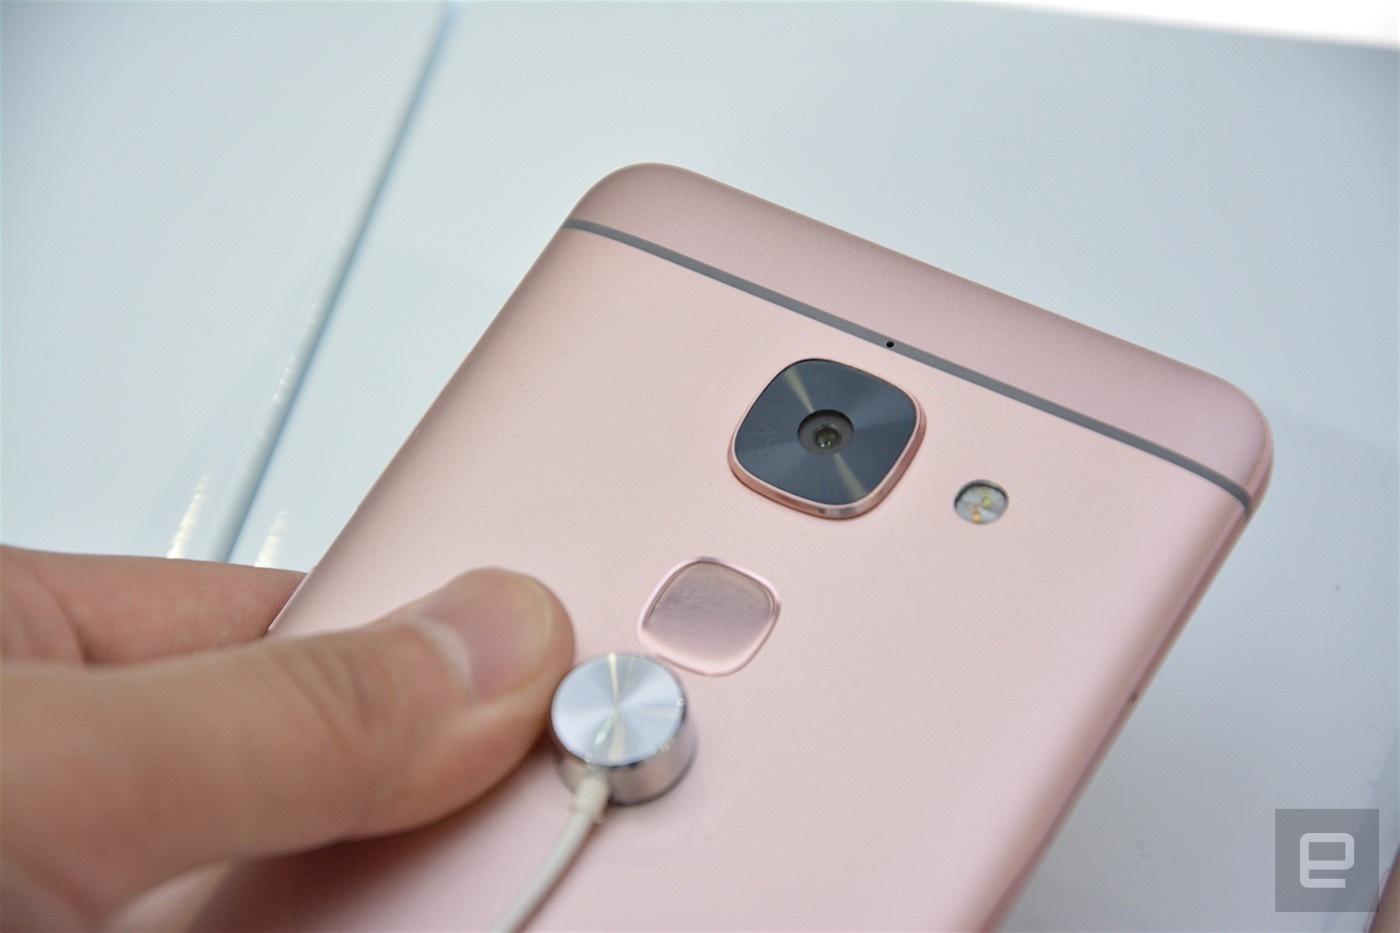 Đón đầu Apple, LeEco ra mắt 3 smartphone bỏ jack 3.5mm